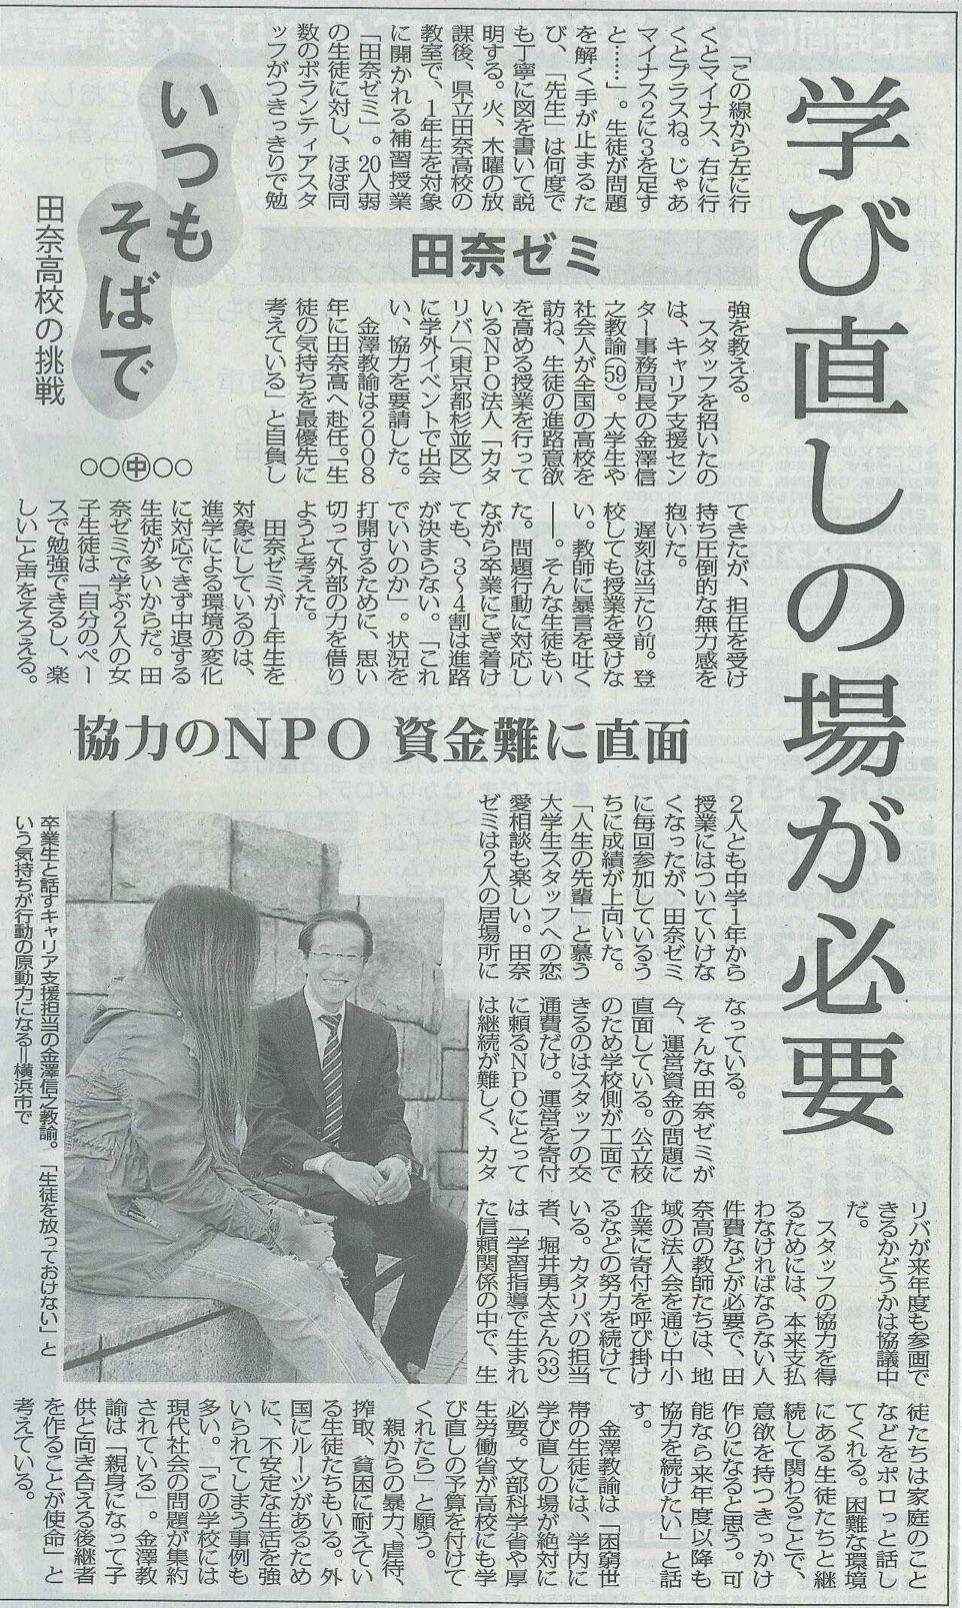 田奈ゼミ掲載(毎日新聞)